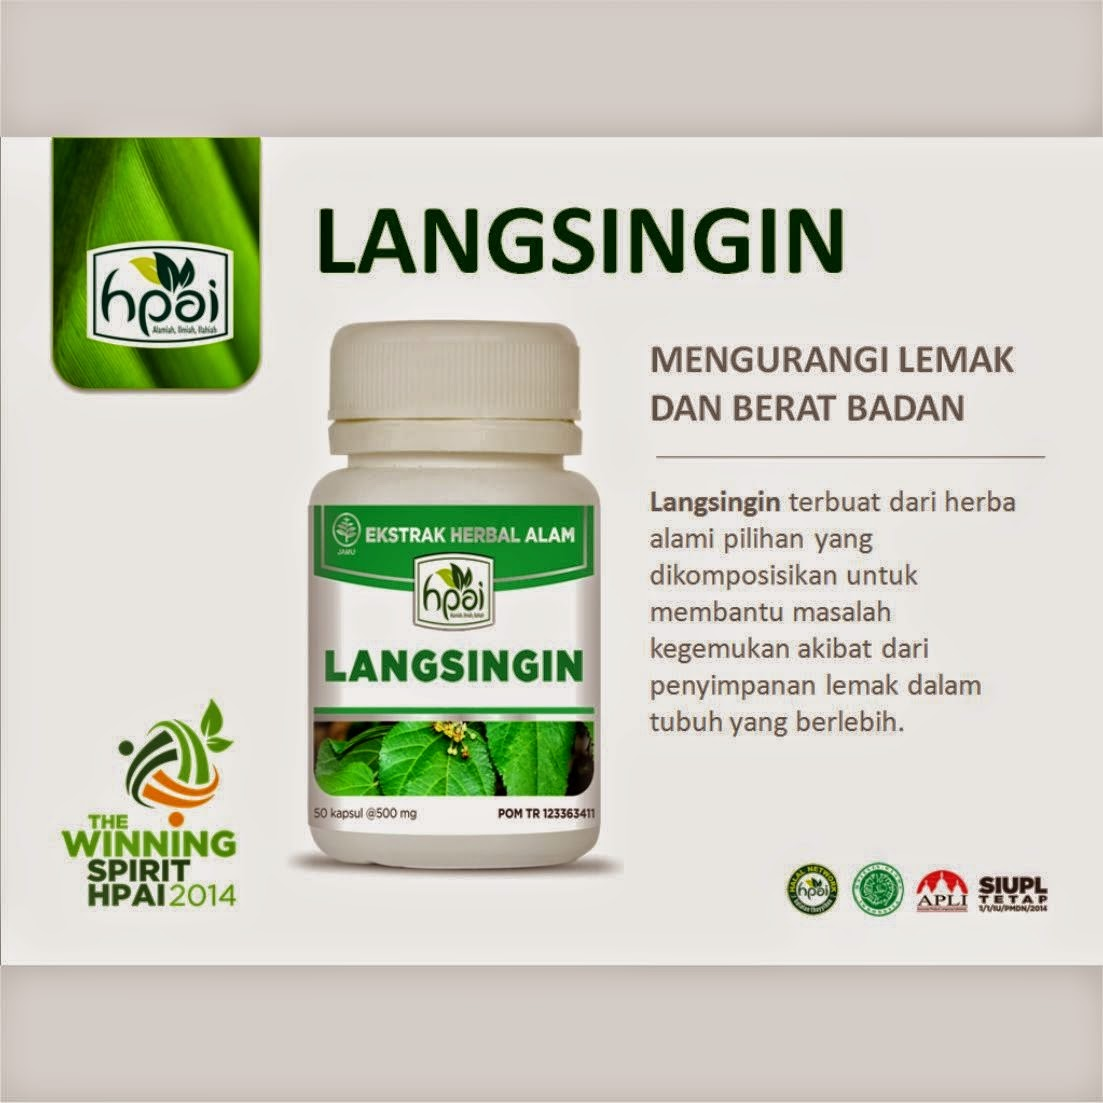 LANGSINGIN HPAI